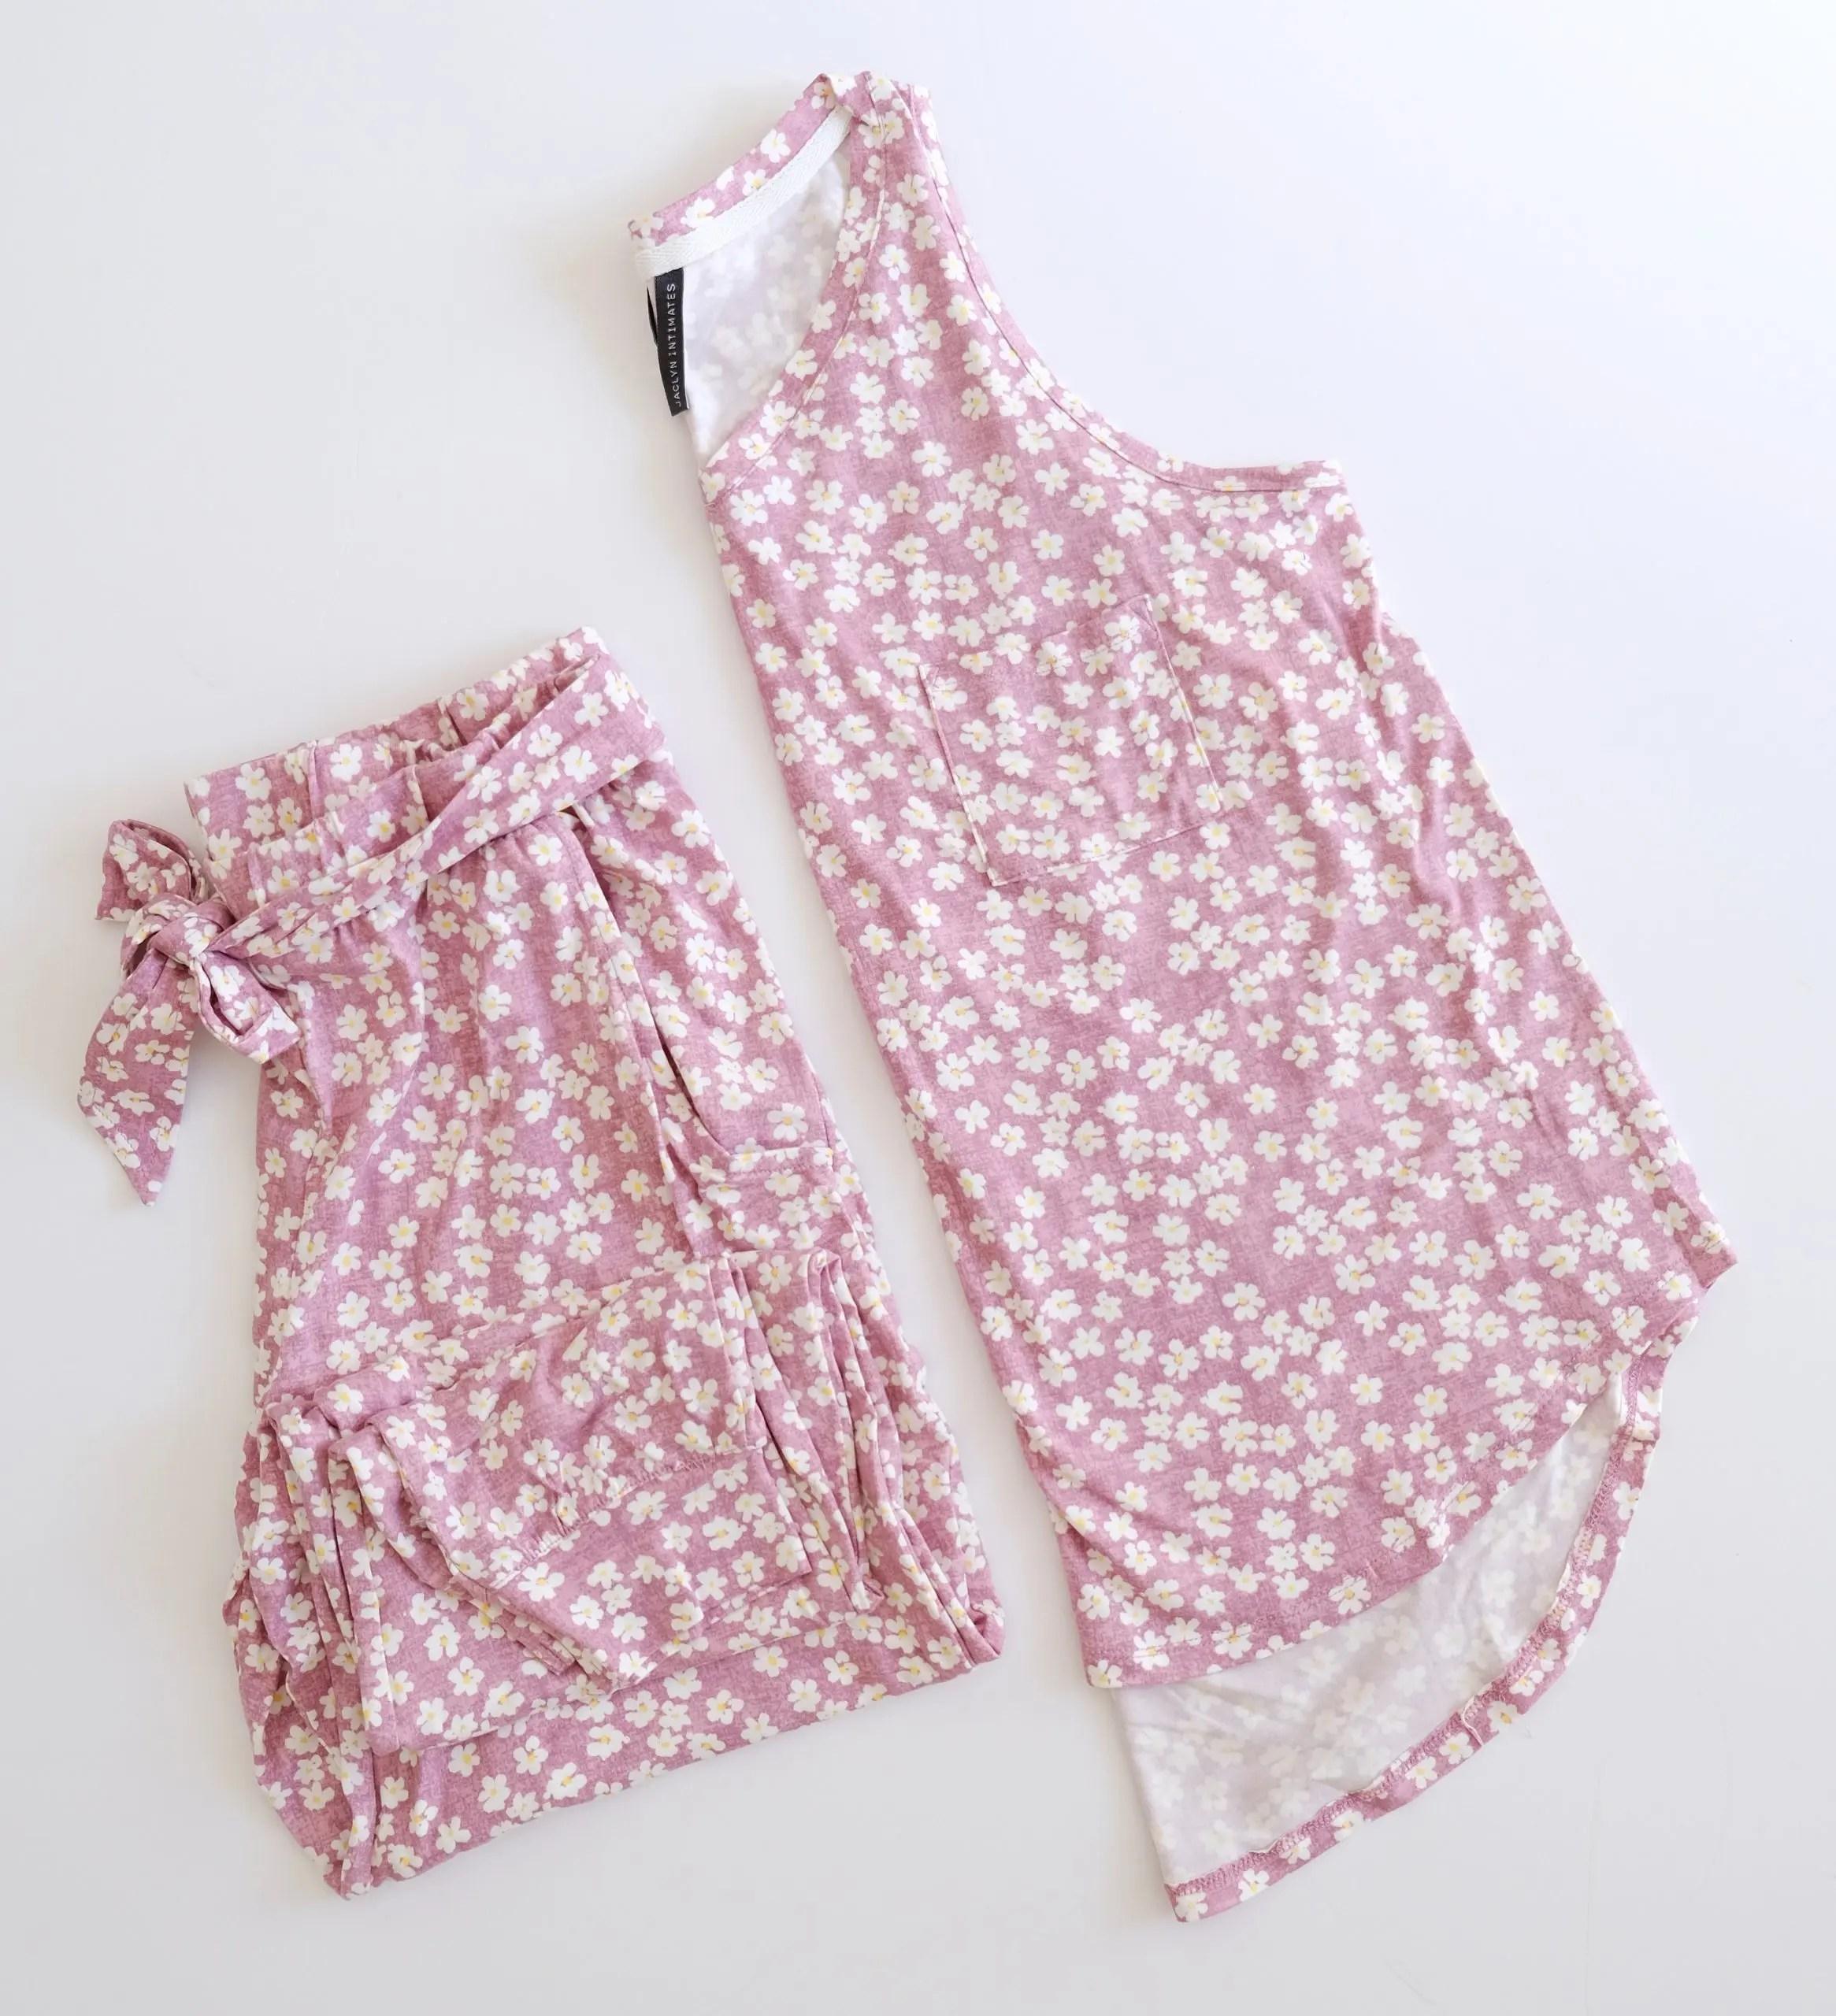 Jaclyn Intimates Women's V-Neck Tank Top and Jogger Pajama Set - daisy print